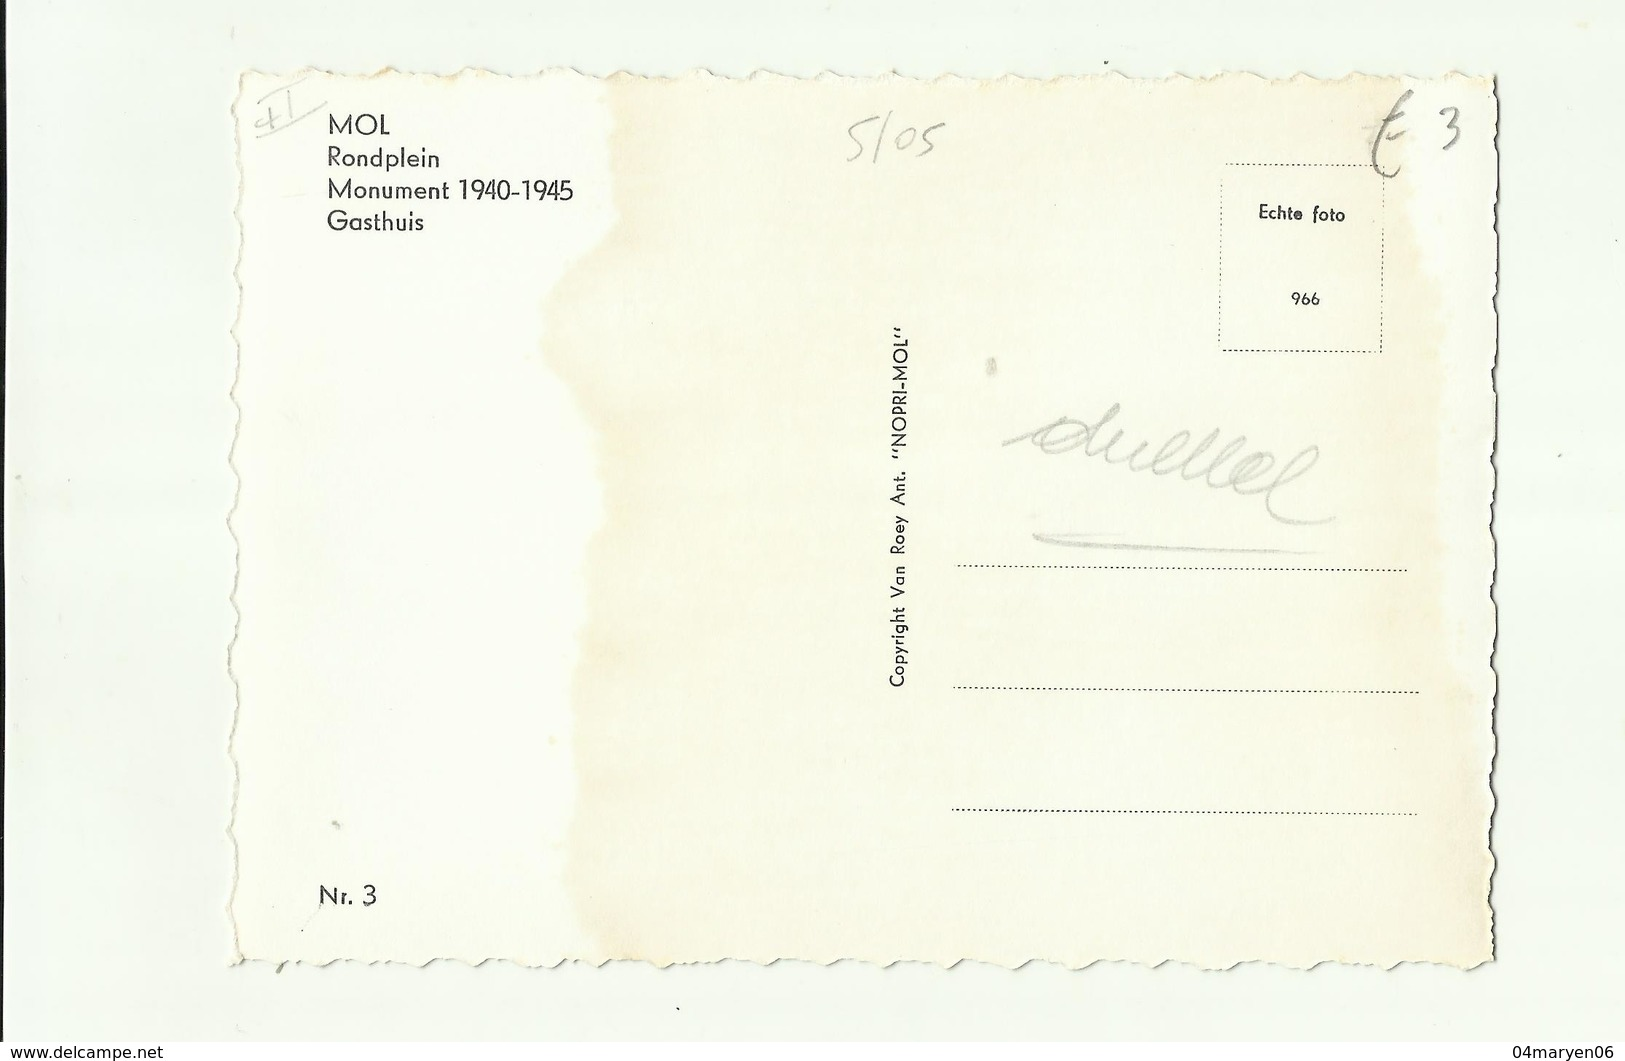 "--**  1  X  MOL   ** .""""Rondplein - Monument 1940-1945-Gasthuis   . """" - Mol"